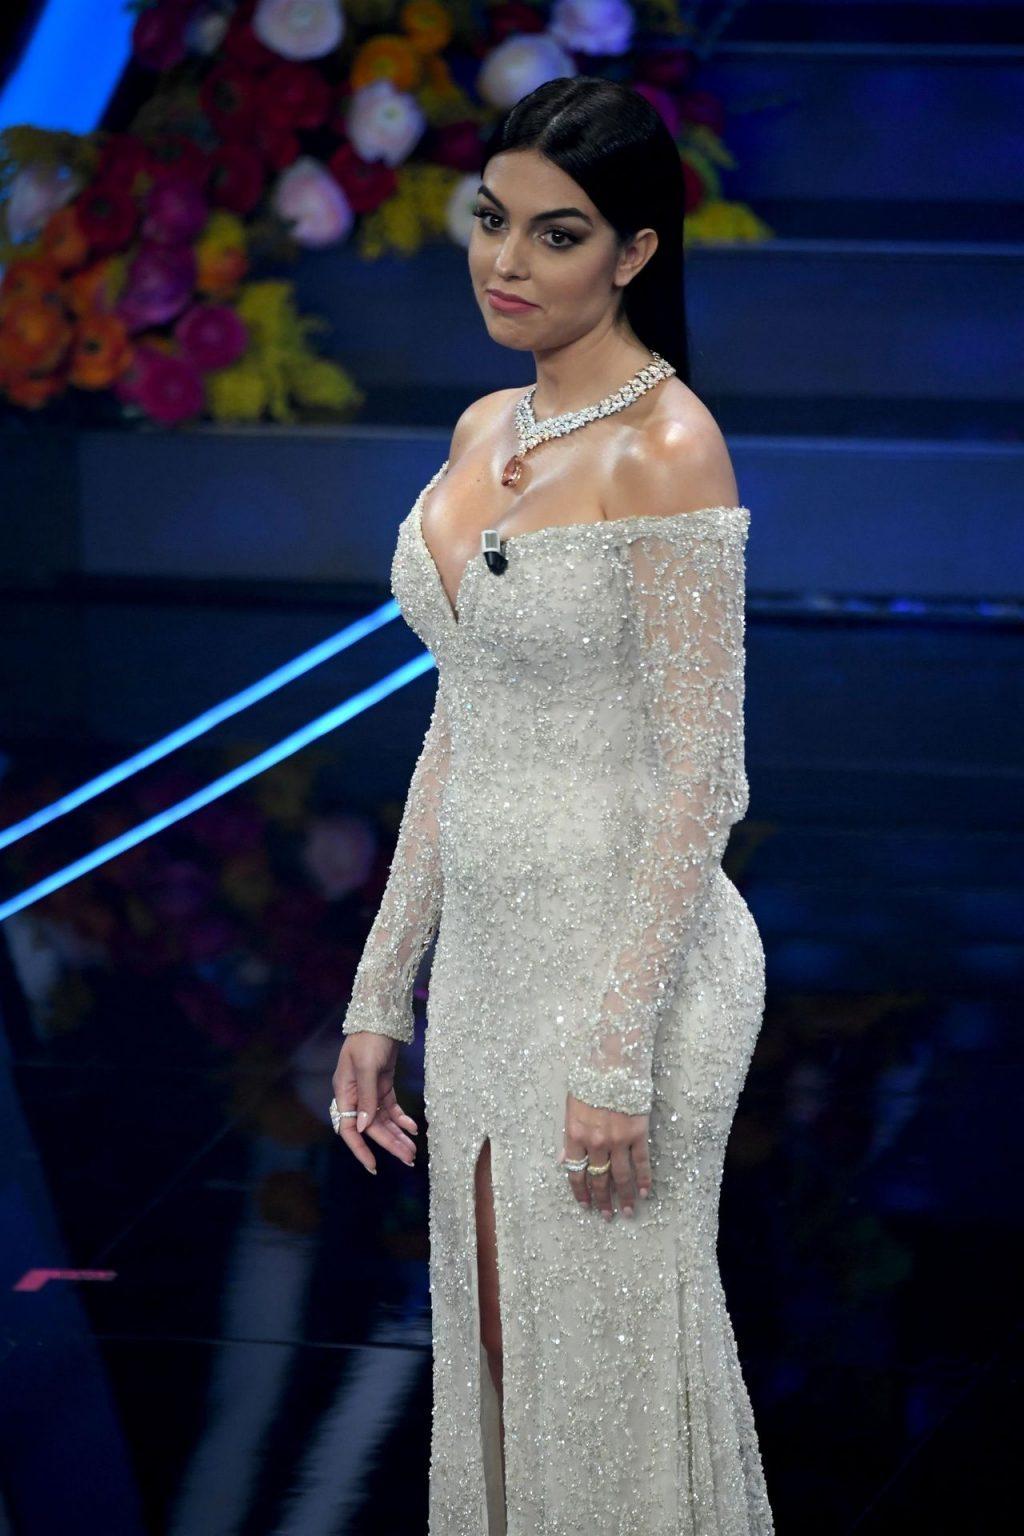 Georgina Rodriguez Wows at the 70th Sanremo Music Festival (57 Photos)